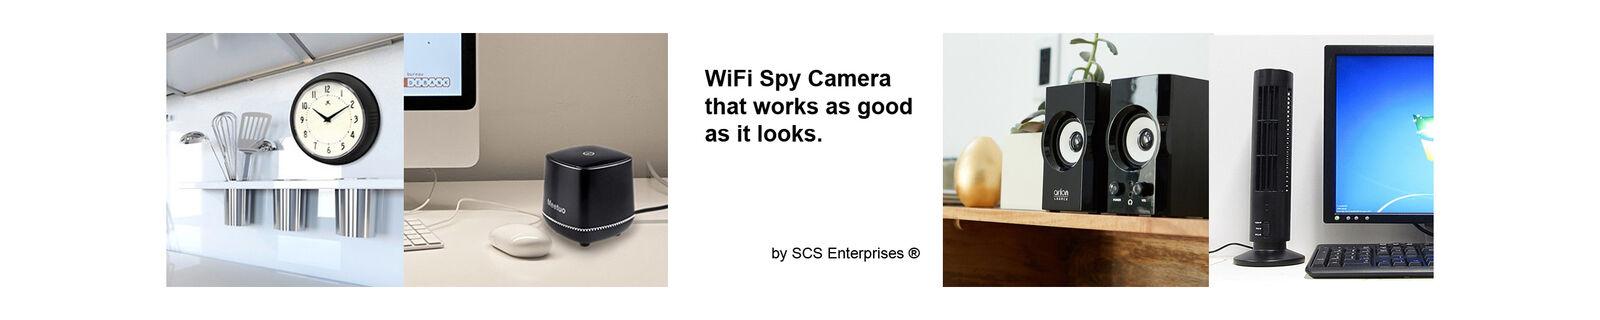 spycameras101